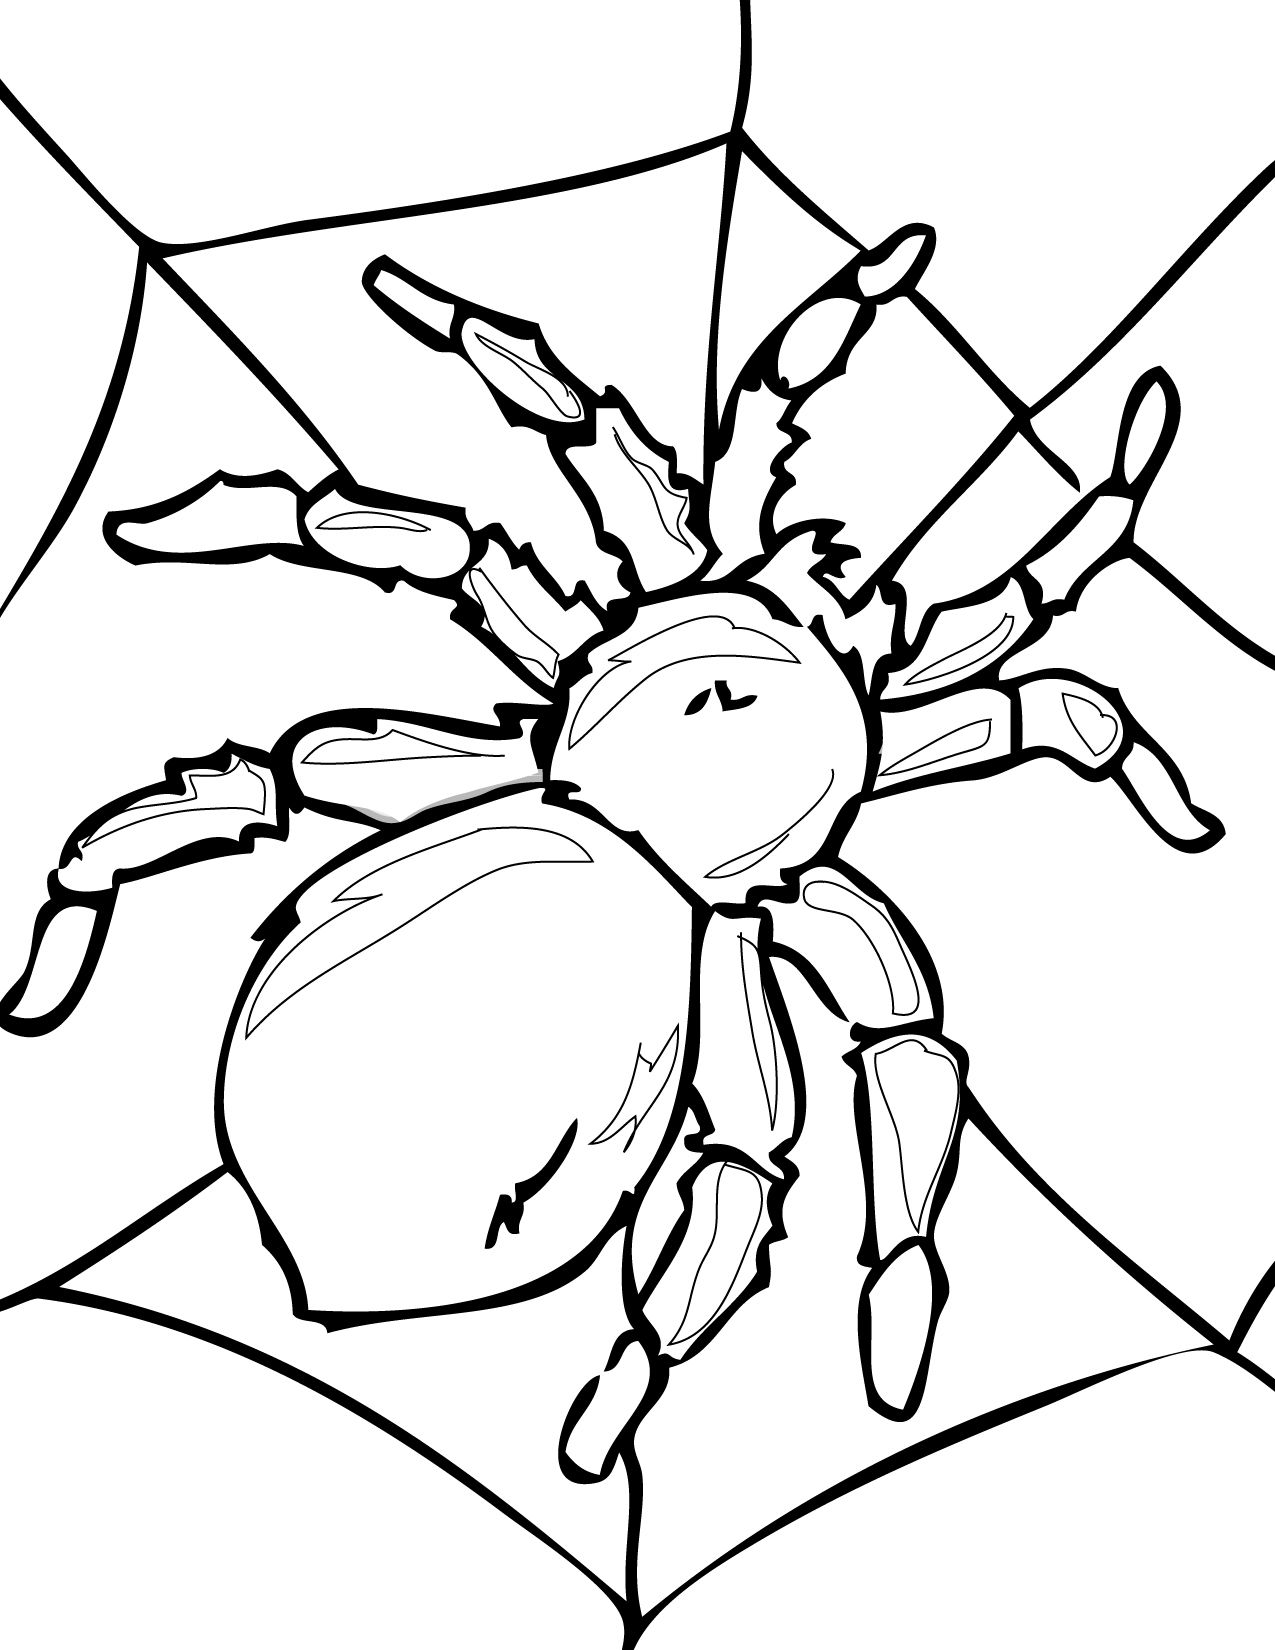 B>spider< B> <b>coloring< B> <b>pages< B> 09 School Teacher